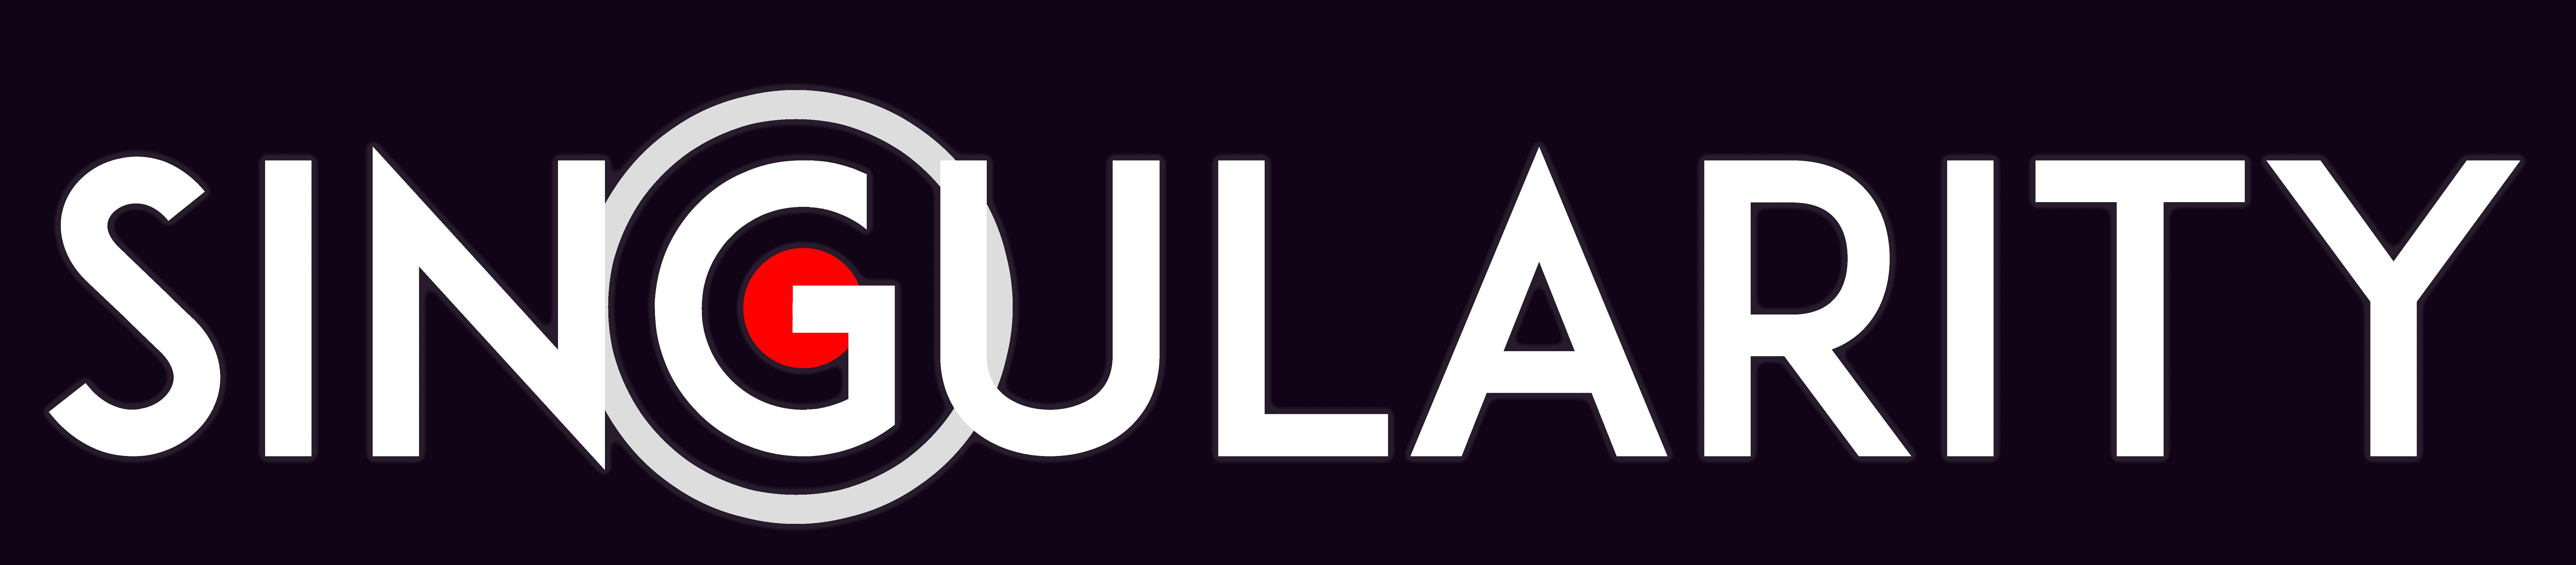 Logo_Singularity_White_DropShadow